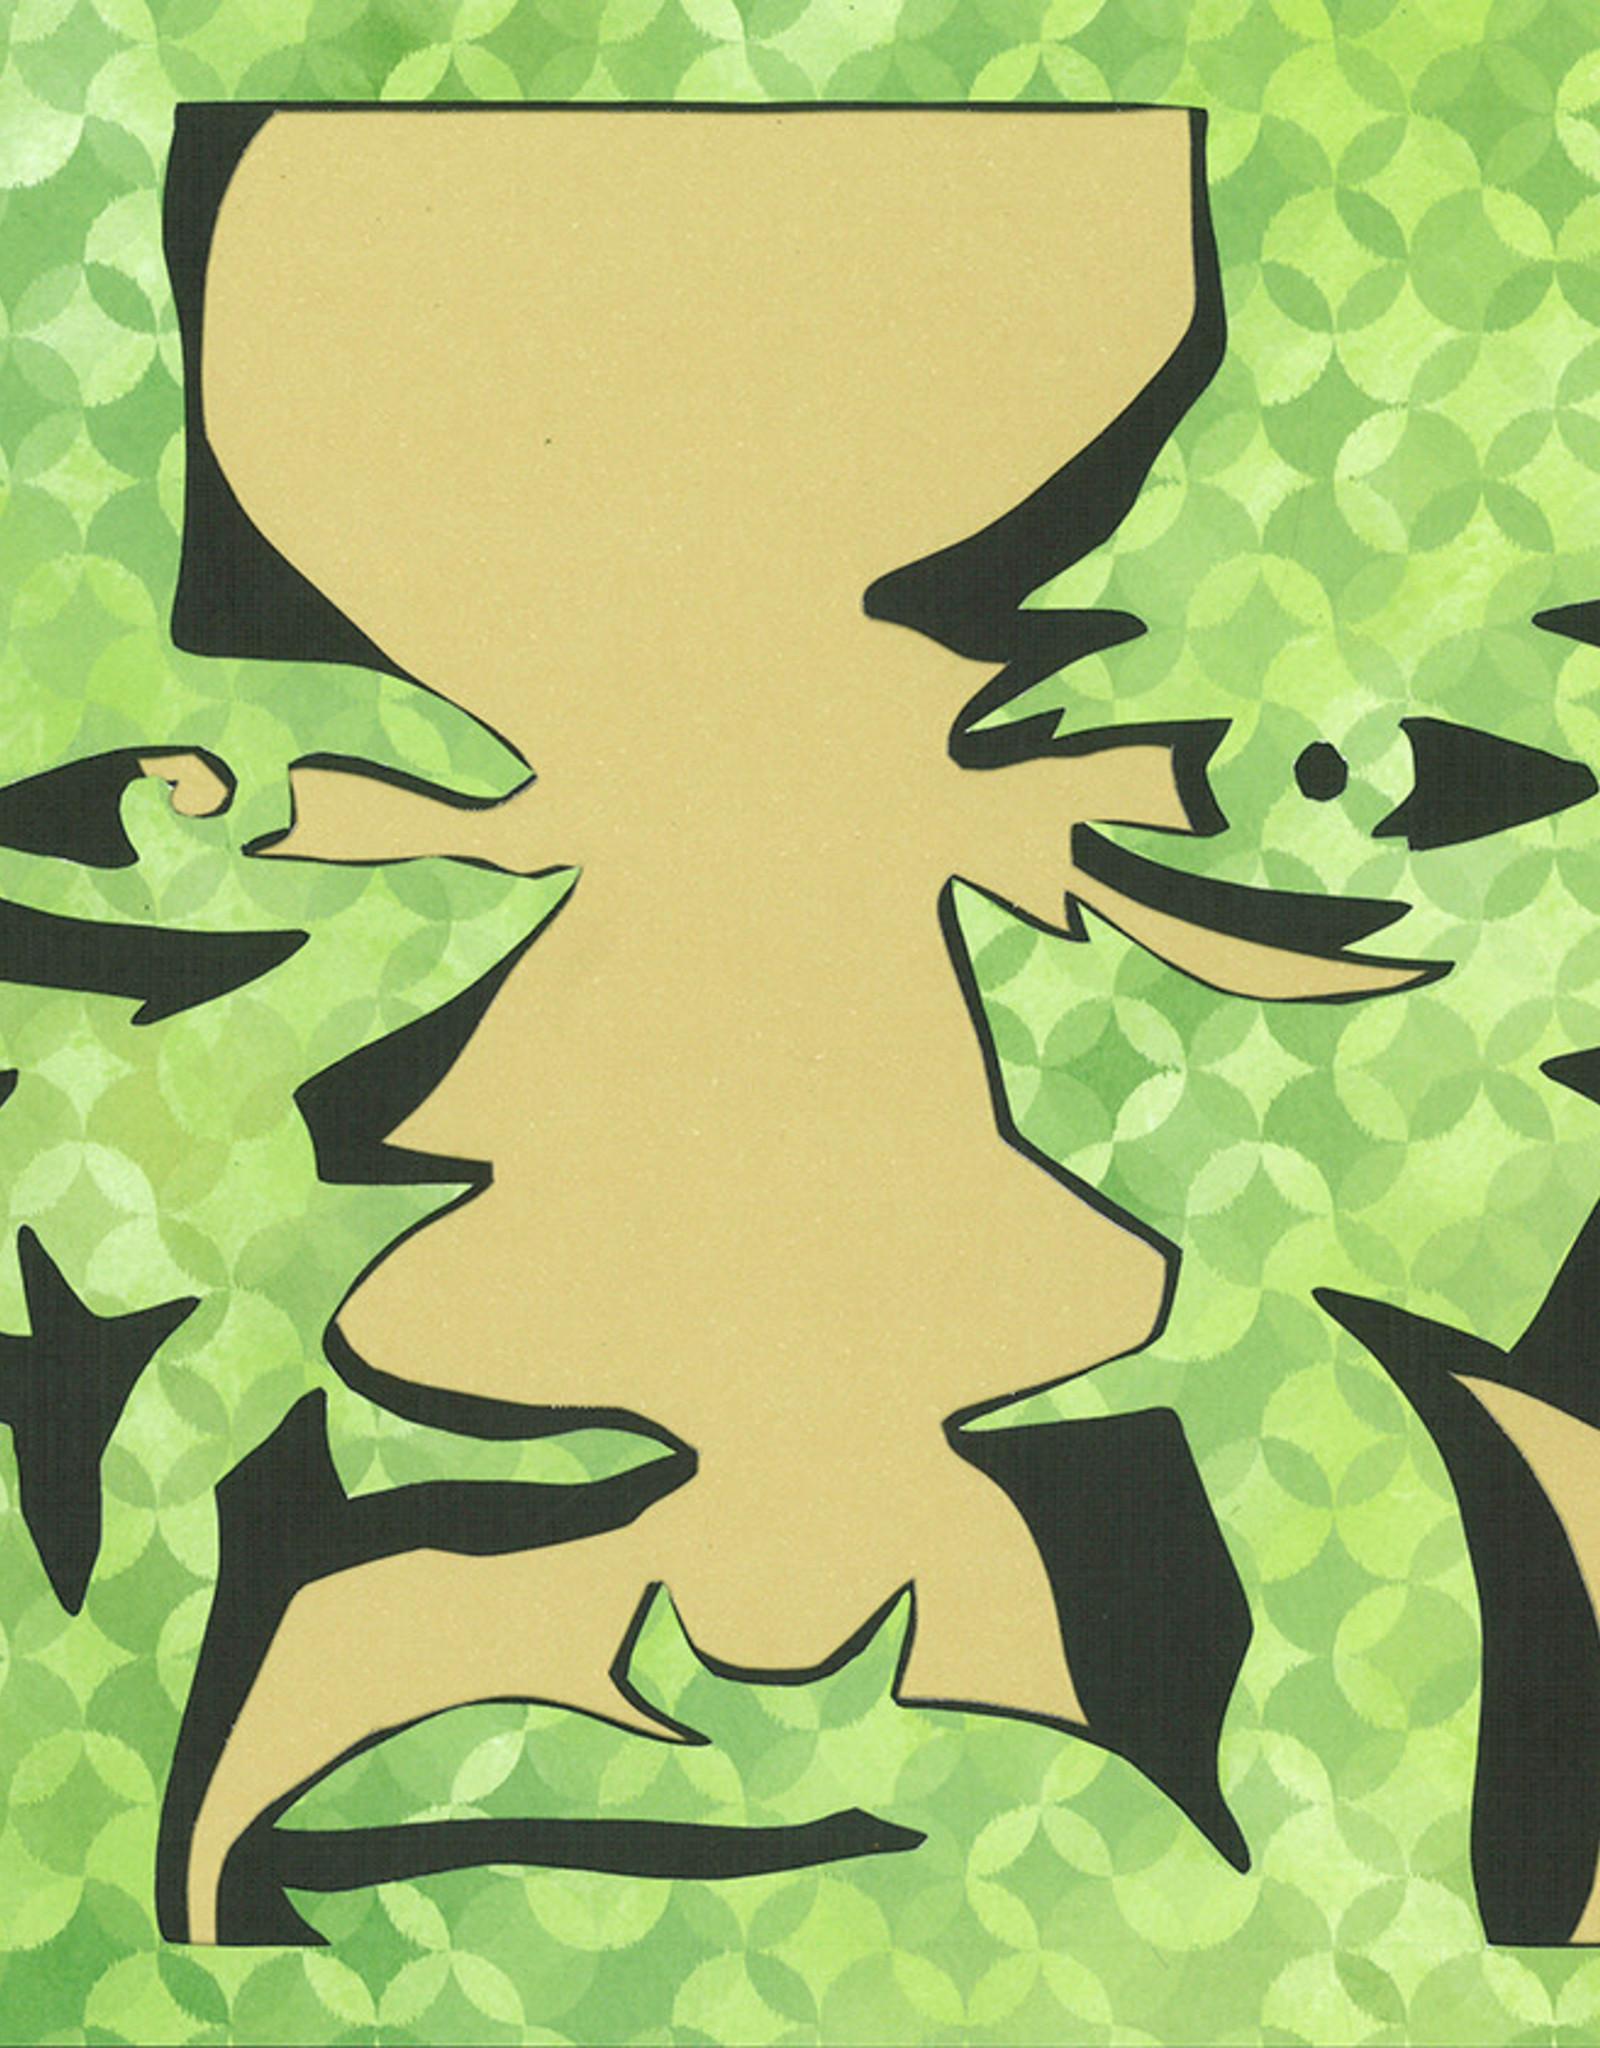 Gray Jones Face to Face -Cutout 9x12 #21